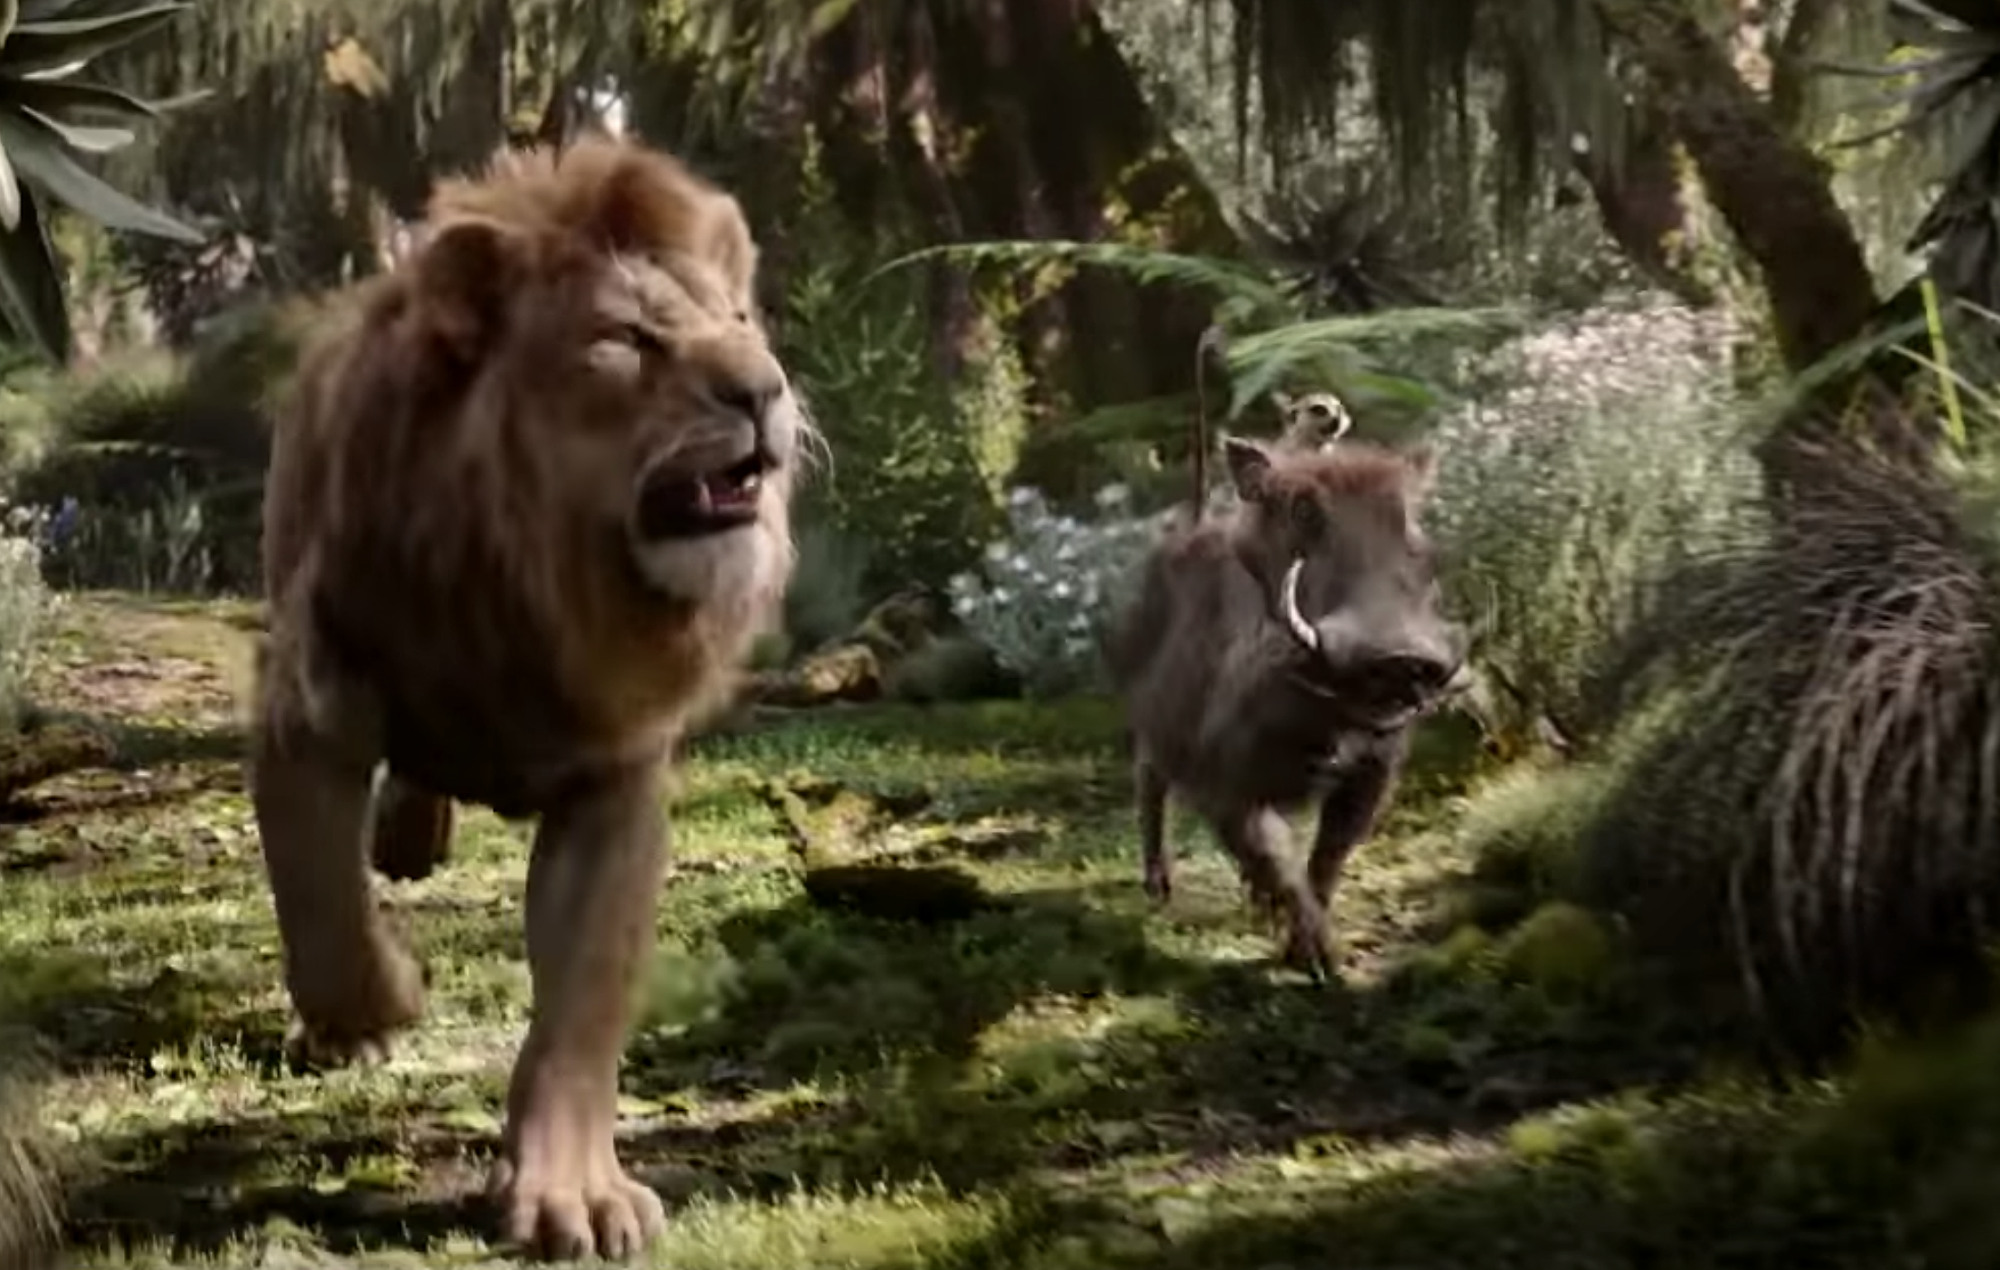 Screengrab from 'Hakuna Matata' clip in 'The Lion King'